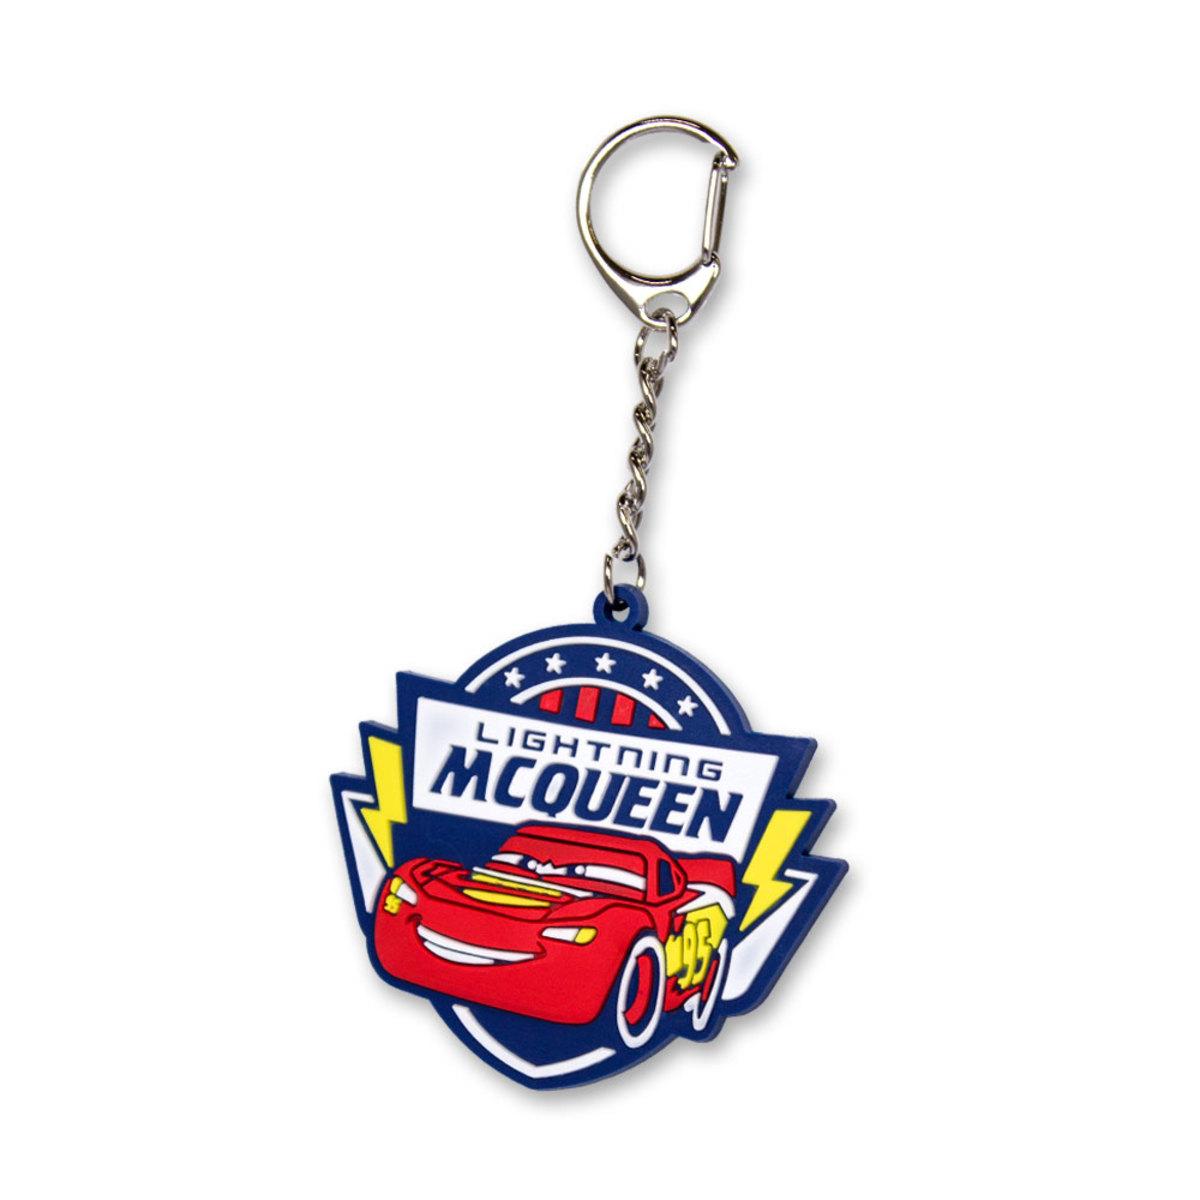 Lightning McQueen Scented Keychain @ Scentco